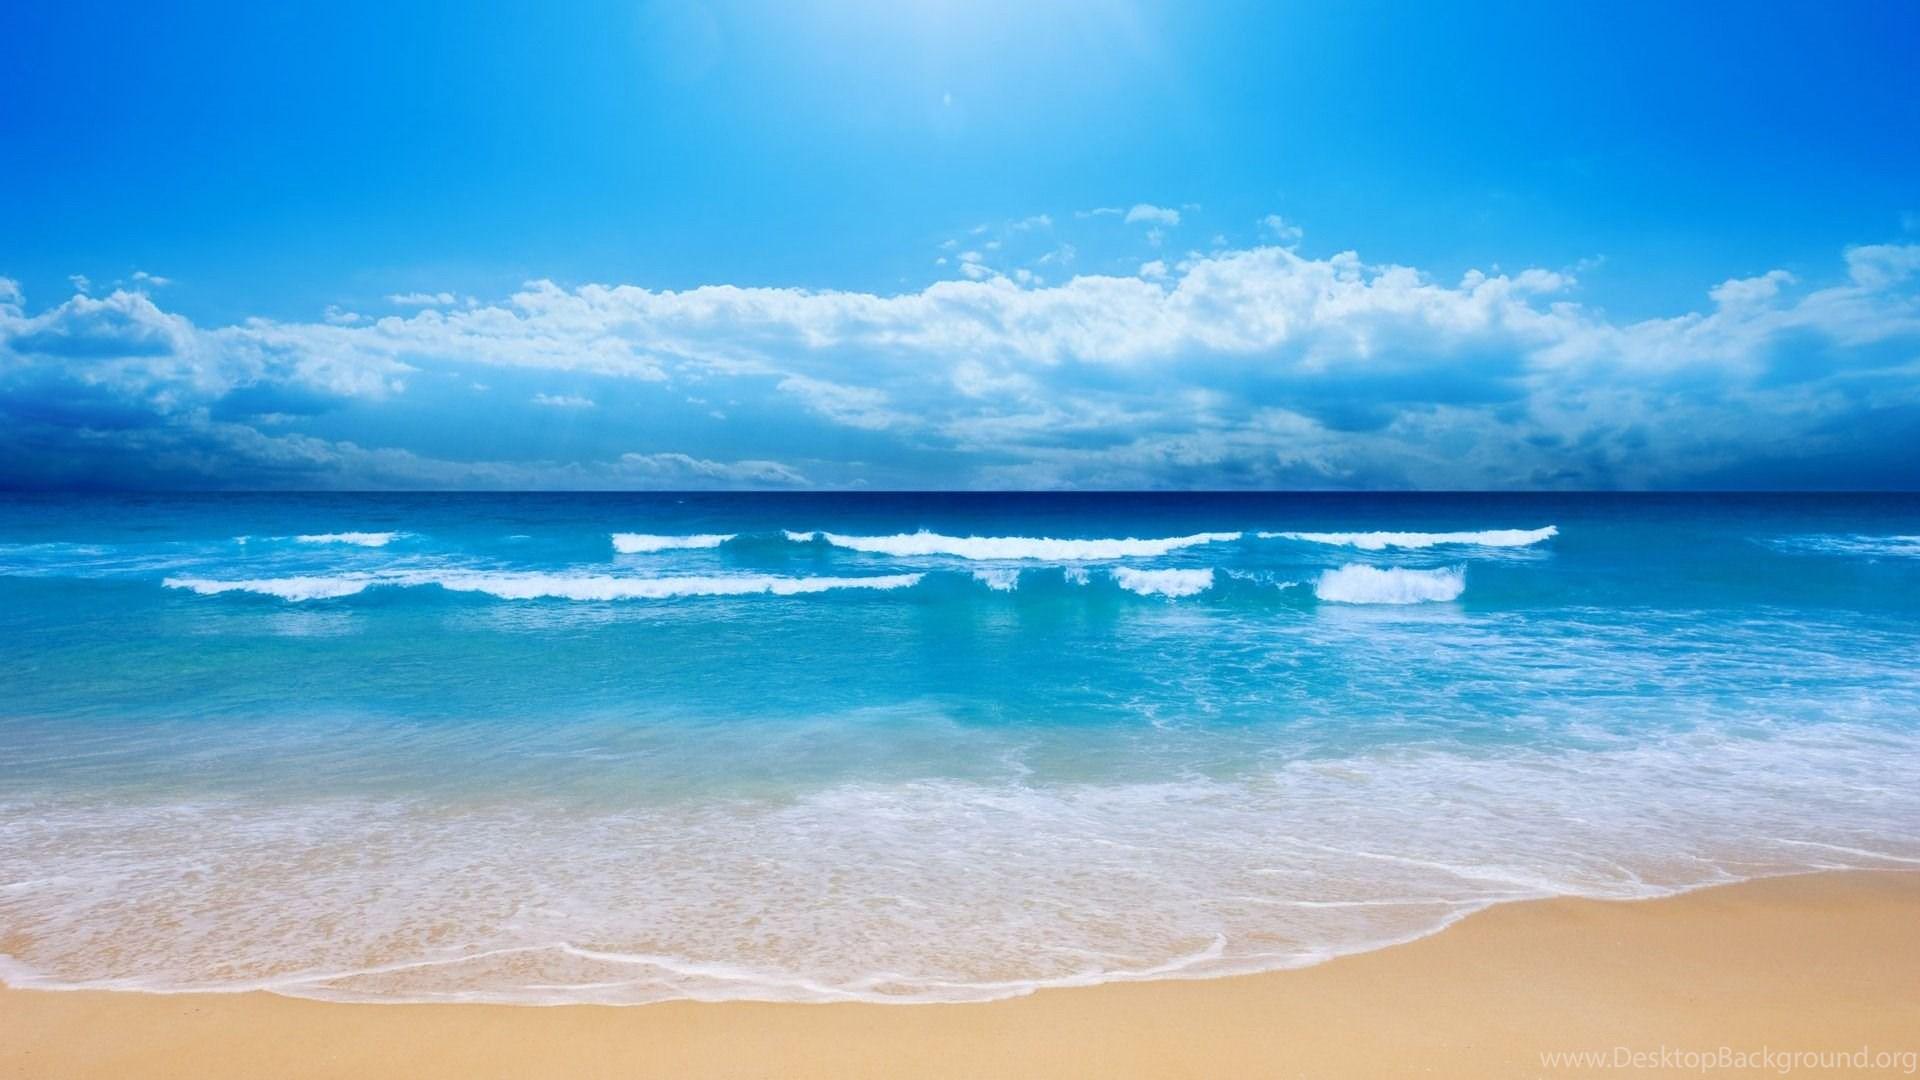 Summer and beach tumblr backgrounds desktop background popular voltagebd Choice Image